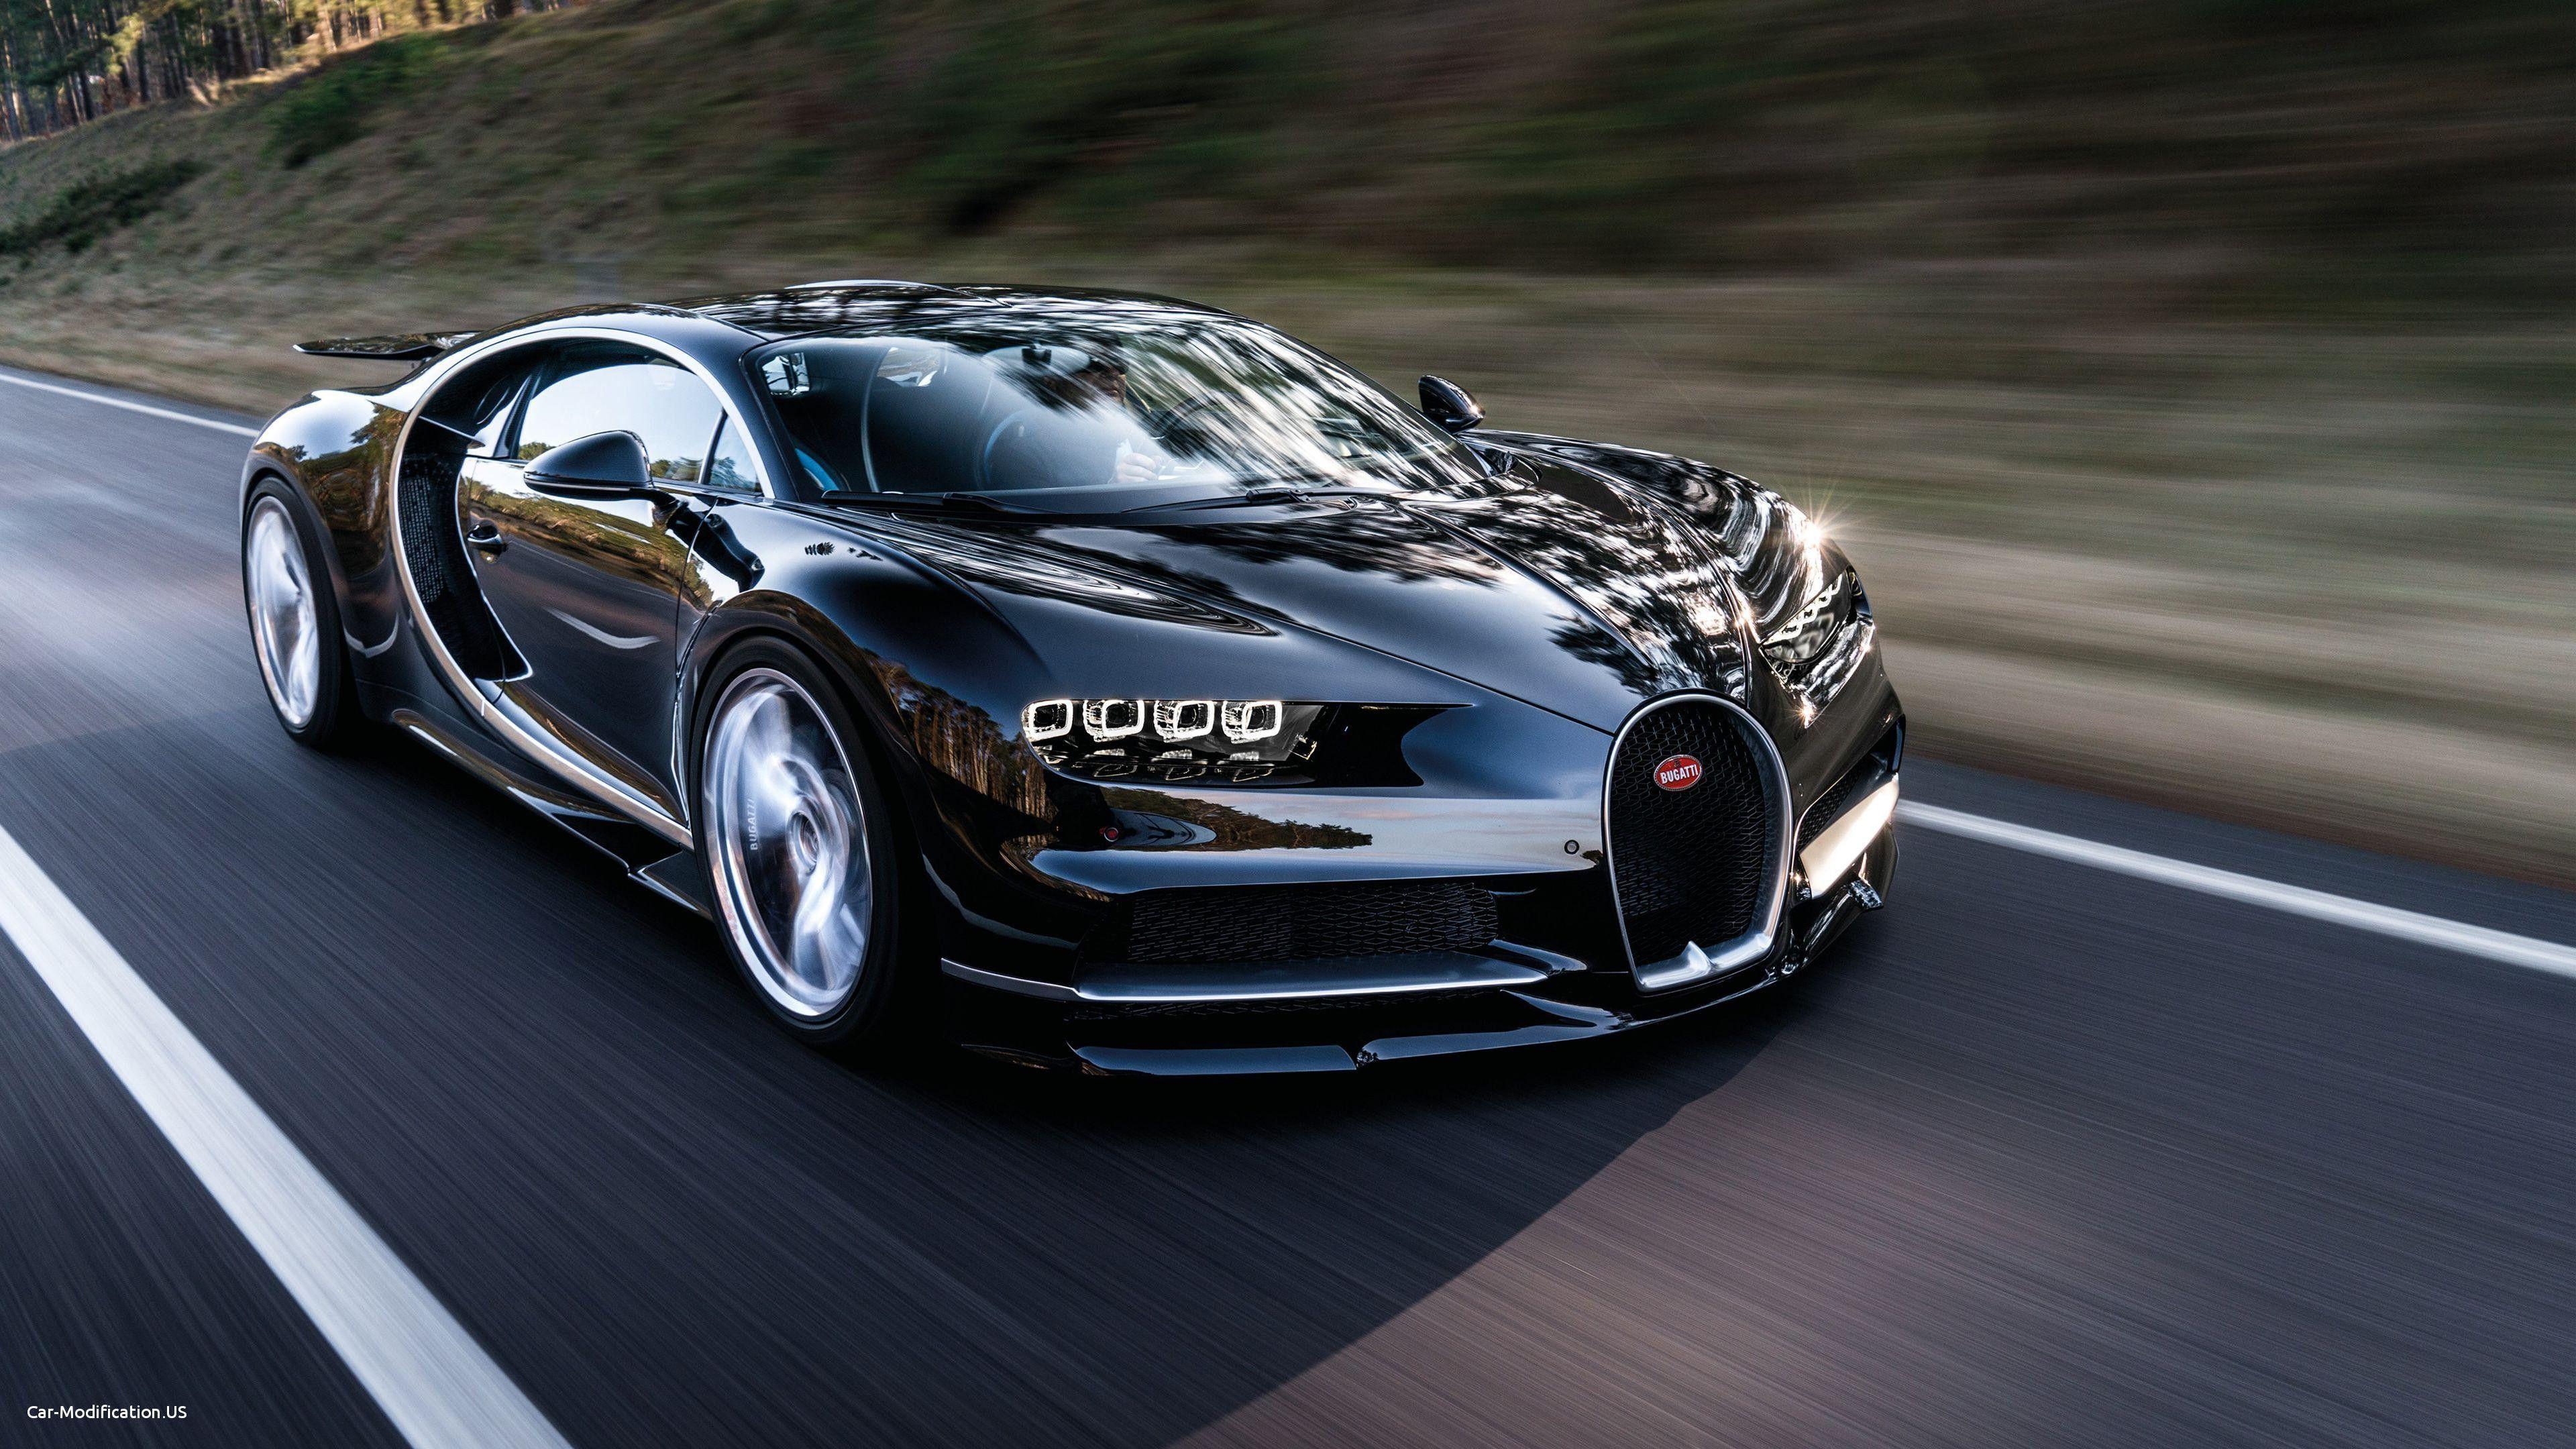 Bugatti Car Hd Wallpapers Desktop Best Bugatti Veyron Hd 4k Bikes